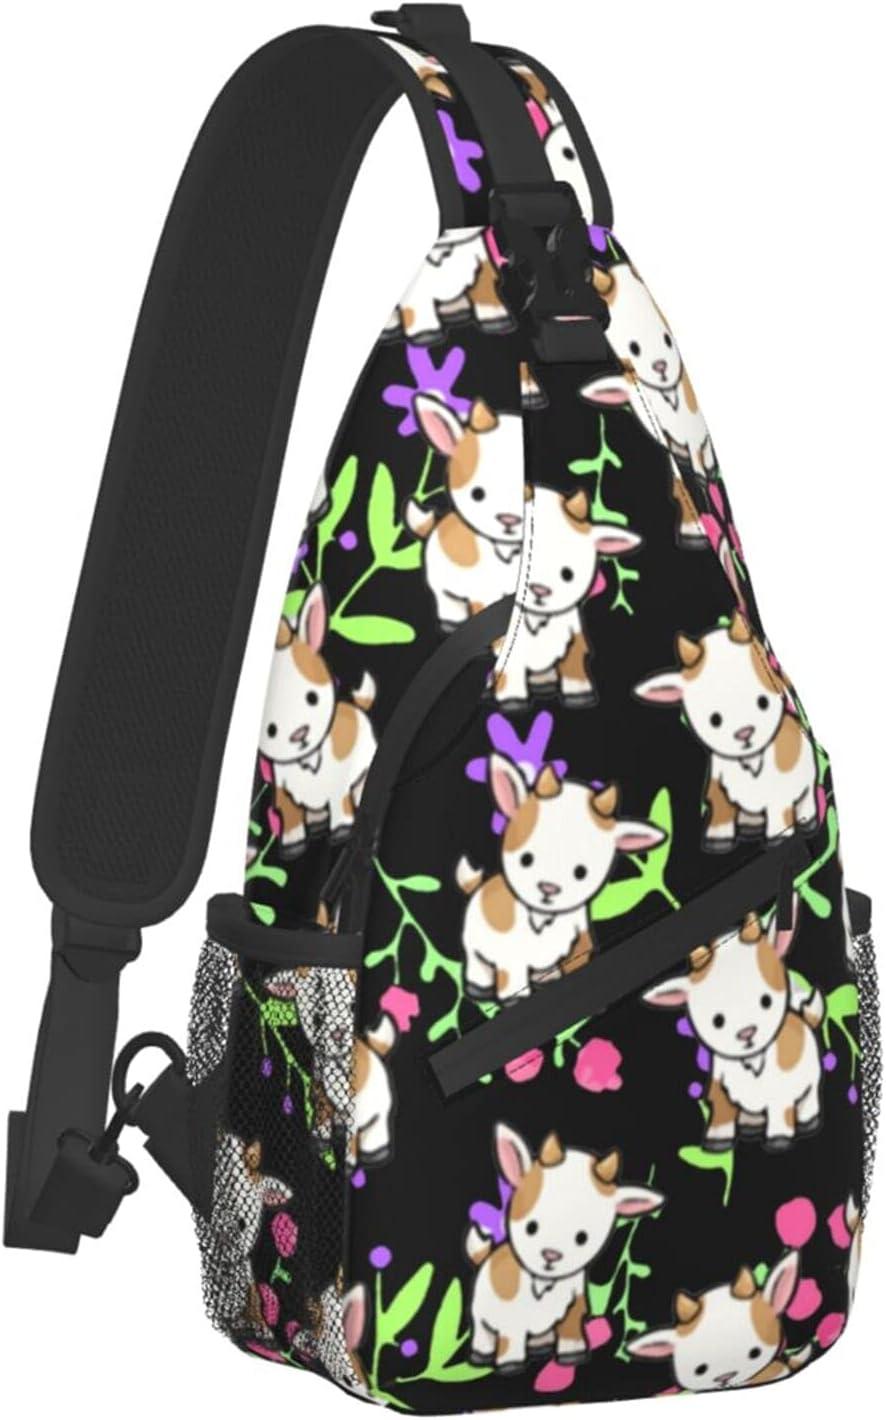 Sling Max 49% OFF Backpack Travel Hiking Daypack Baby Goats Cros 2021 model Kawaii Rope